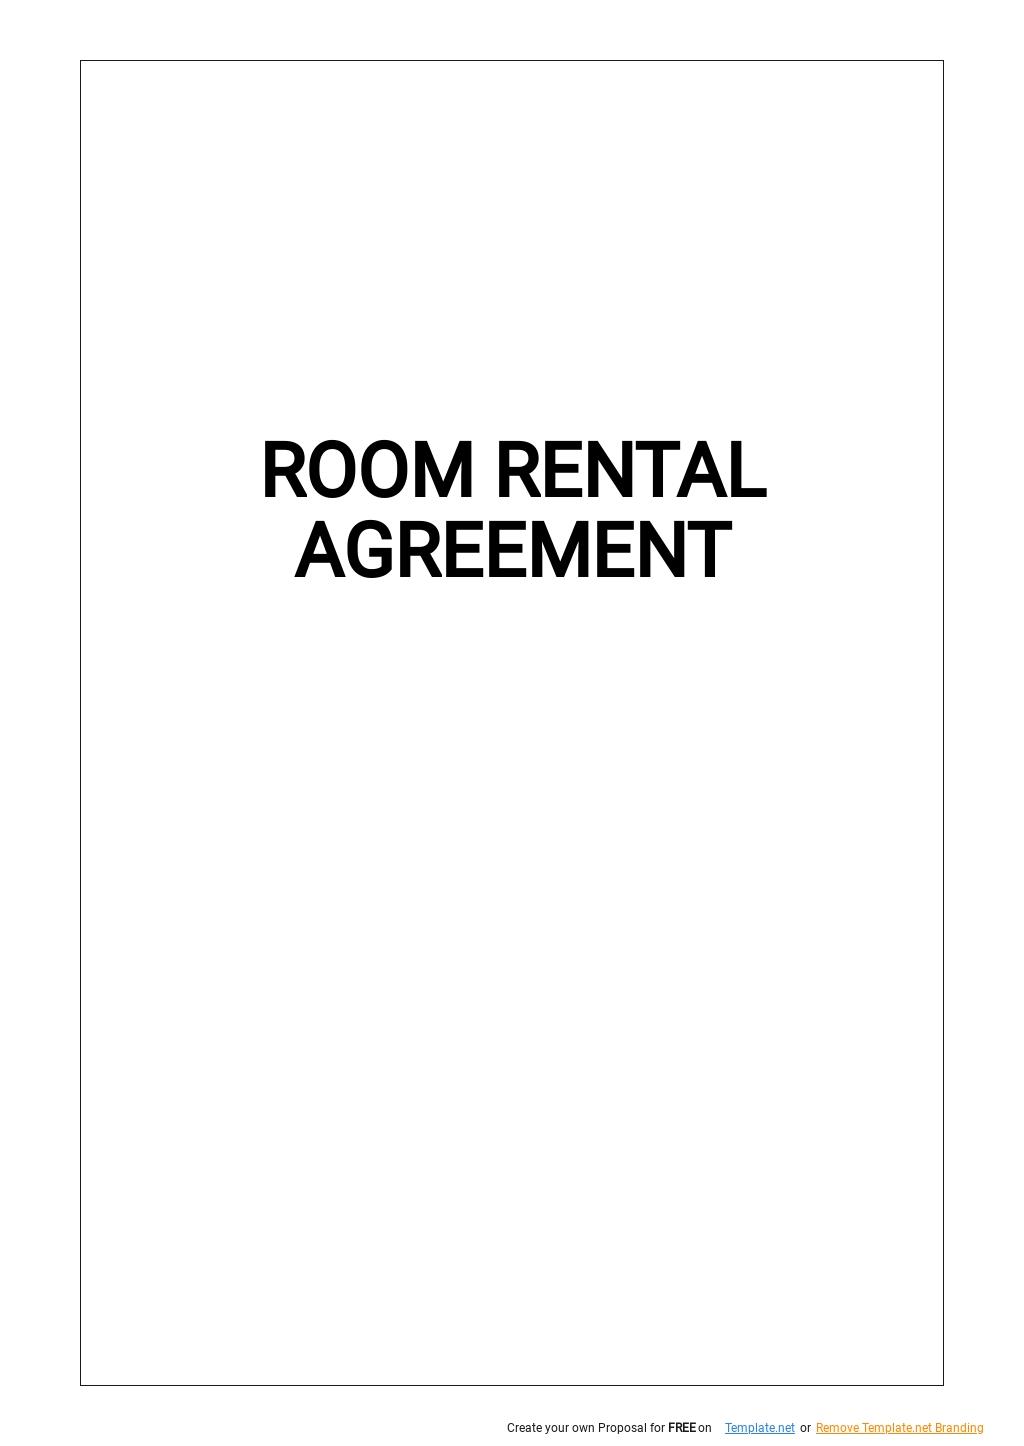 Simple Room Rental Agreement Template.jpe